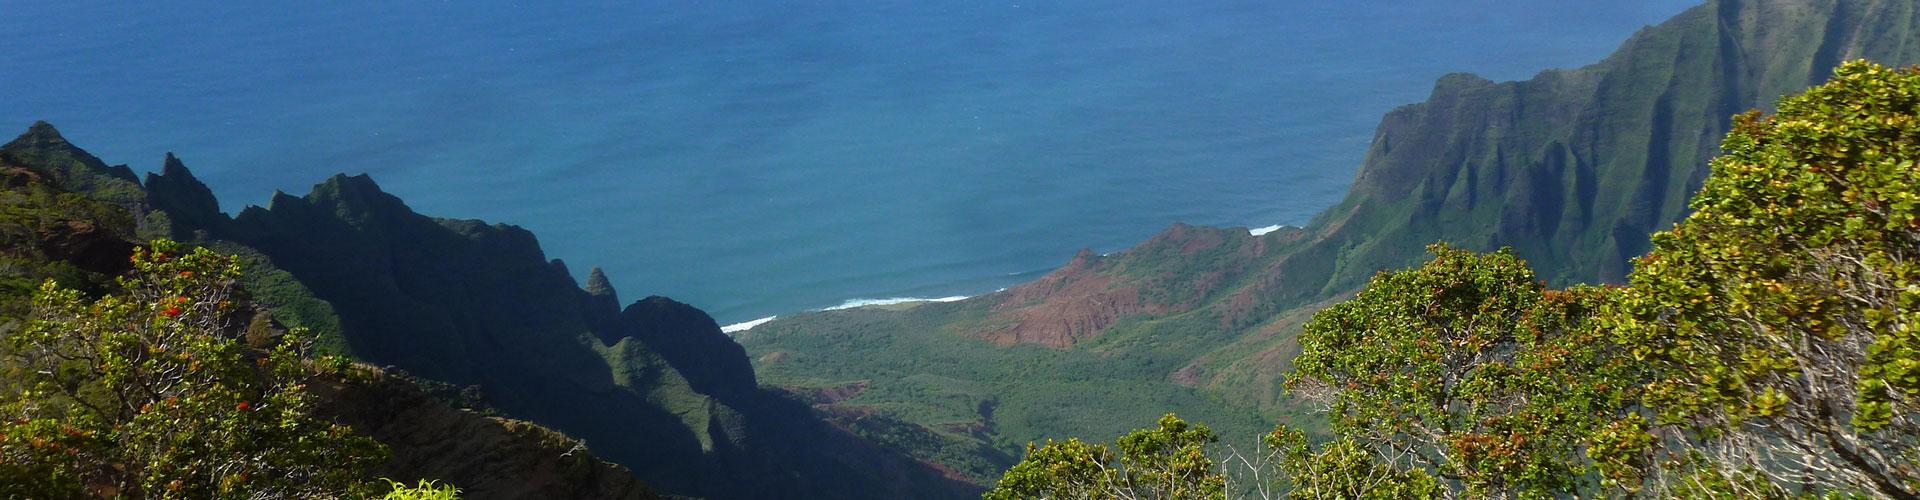 Hawaii – L'isola di Kauai